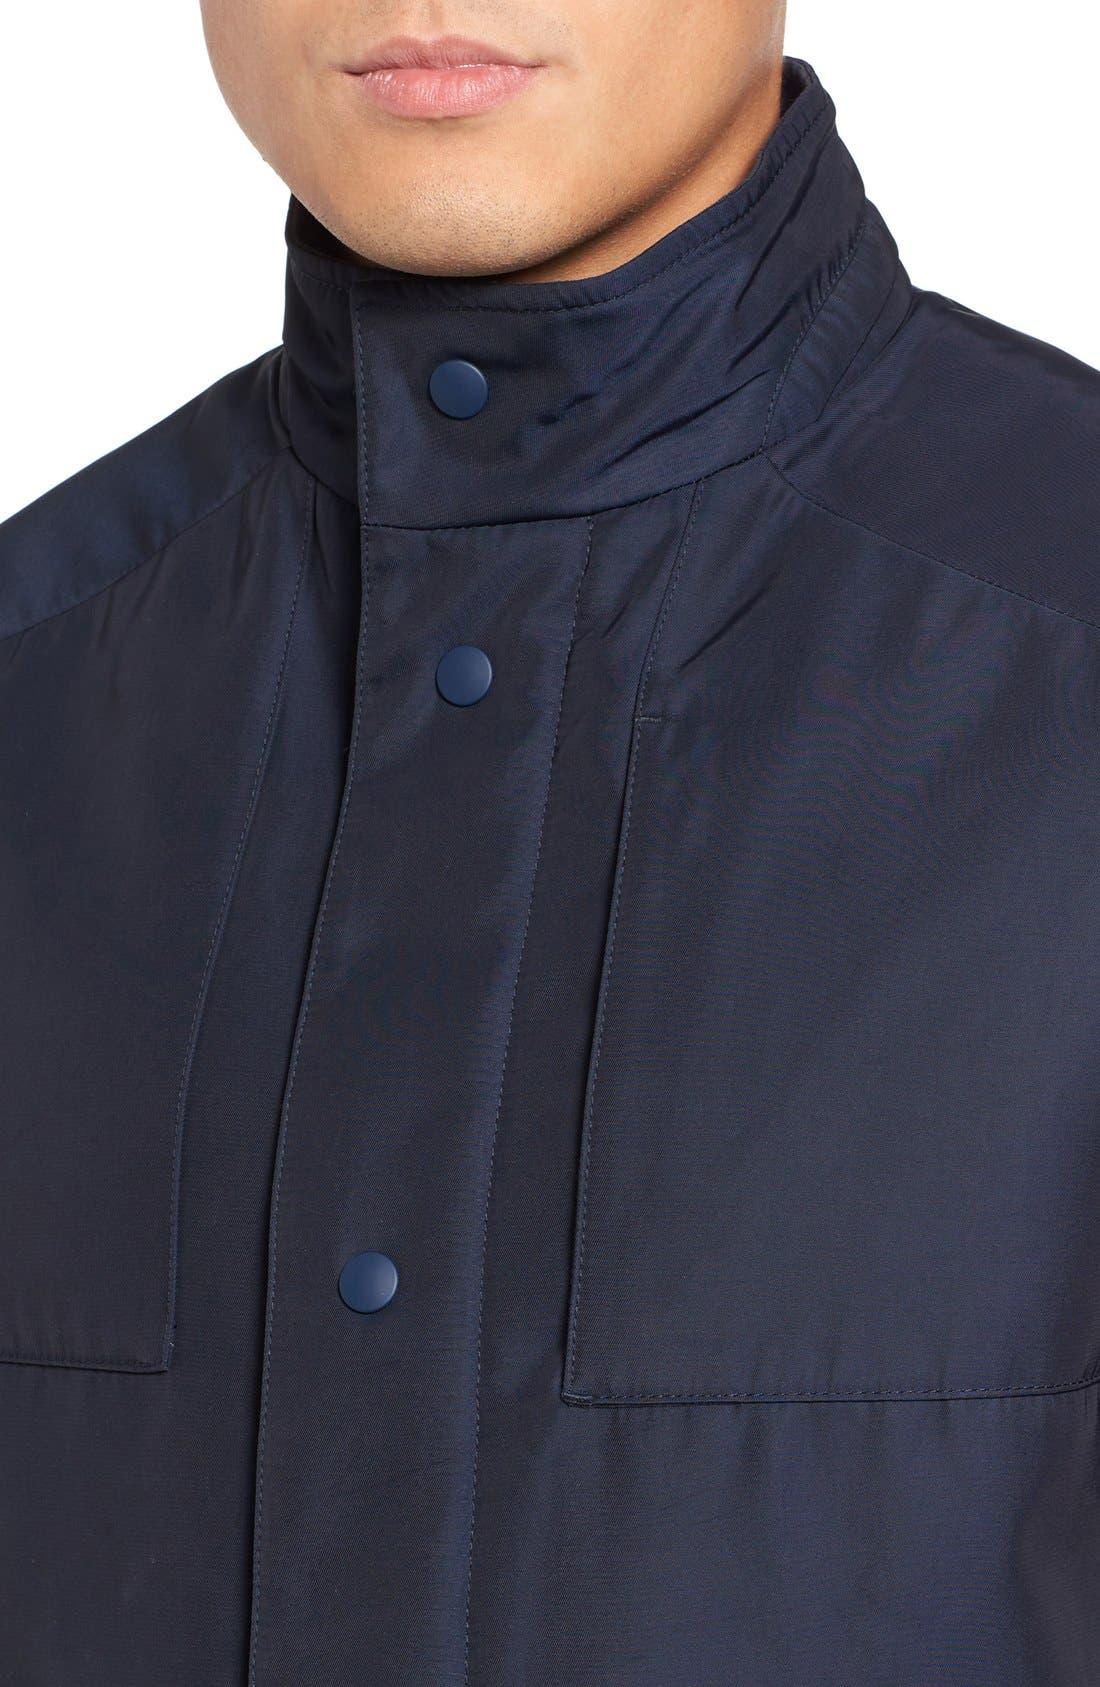 Lightweight Jacket,                             Alternate thumbnail 4, color,                             Navy